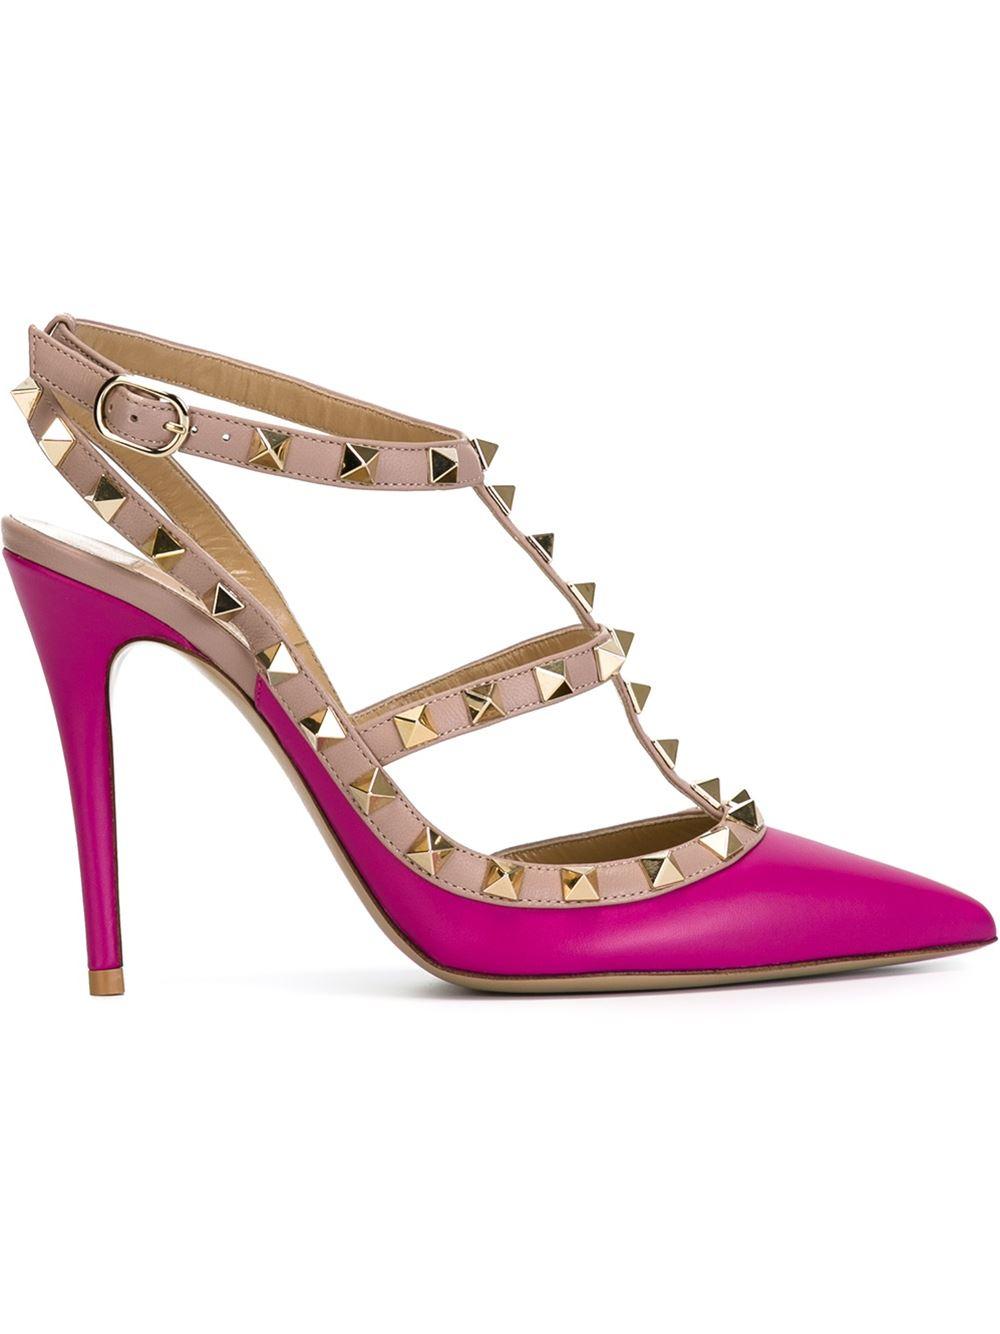 valentino rockstud pumps in pink lyst